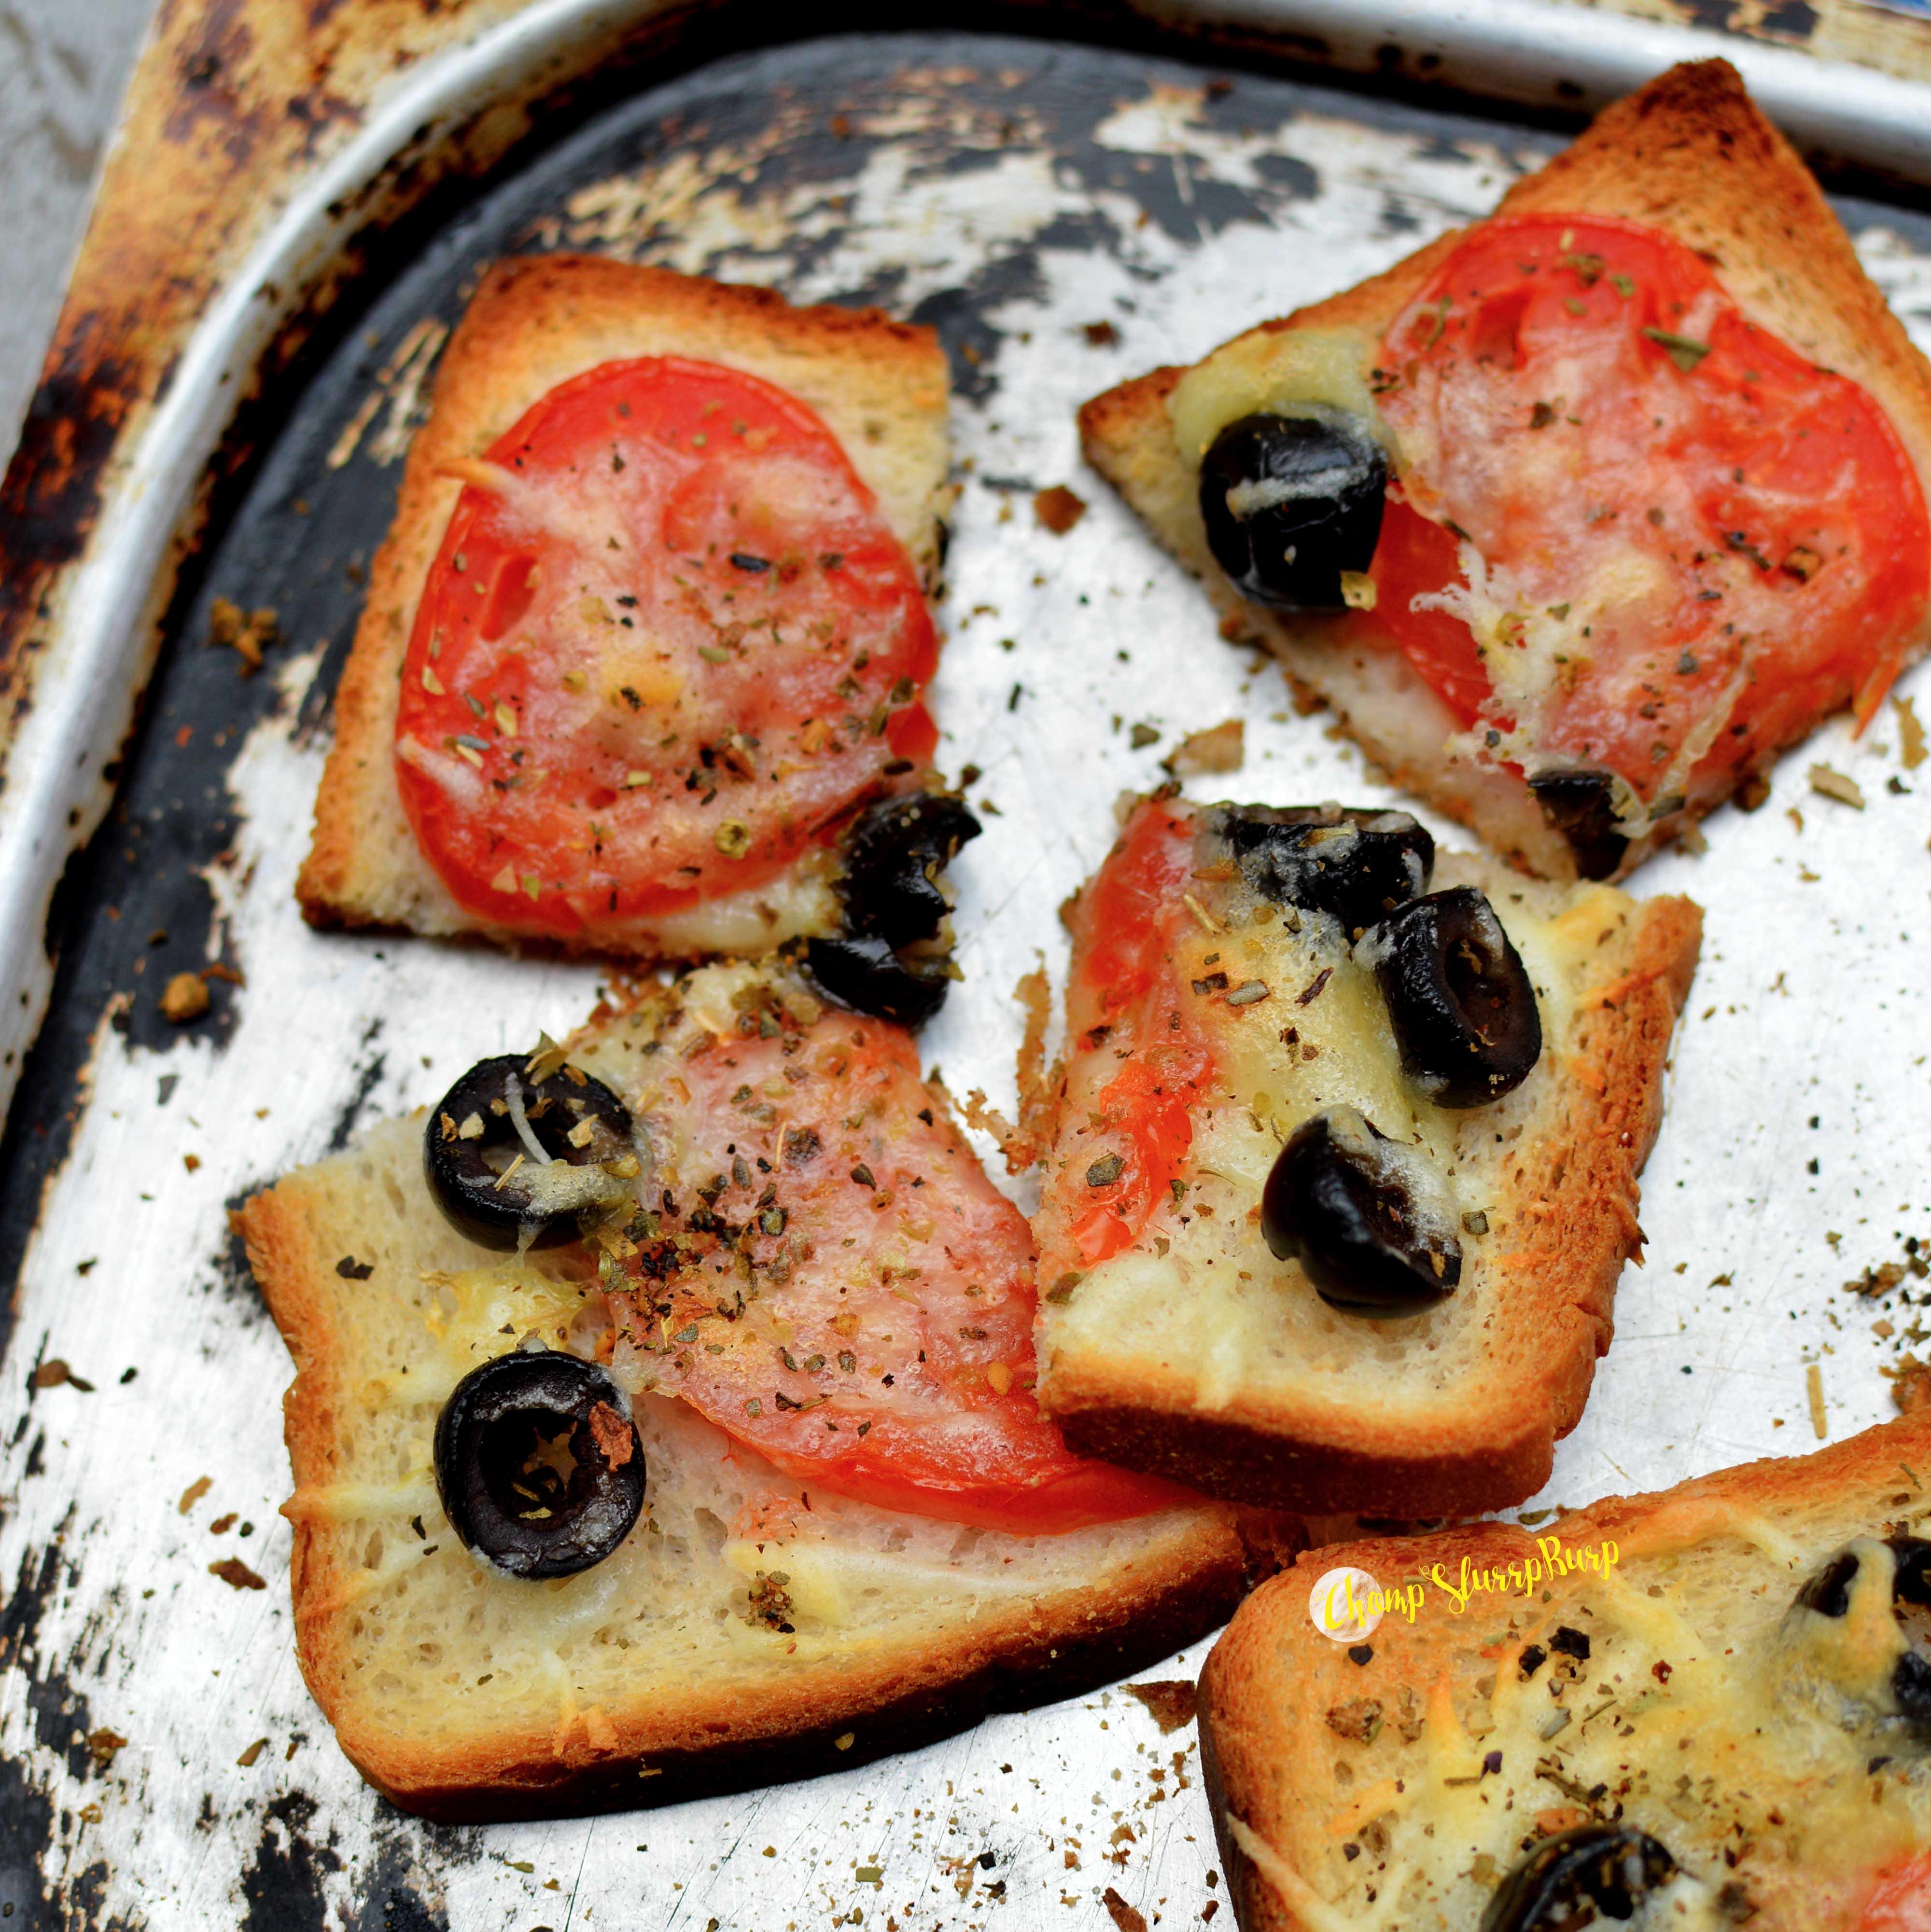 Tomato and Olive Toast